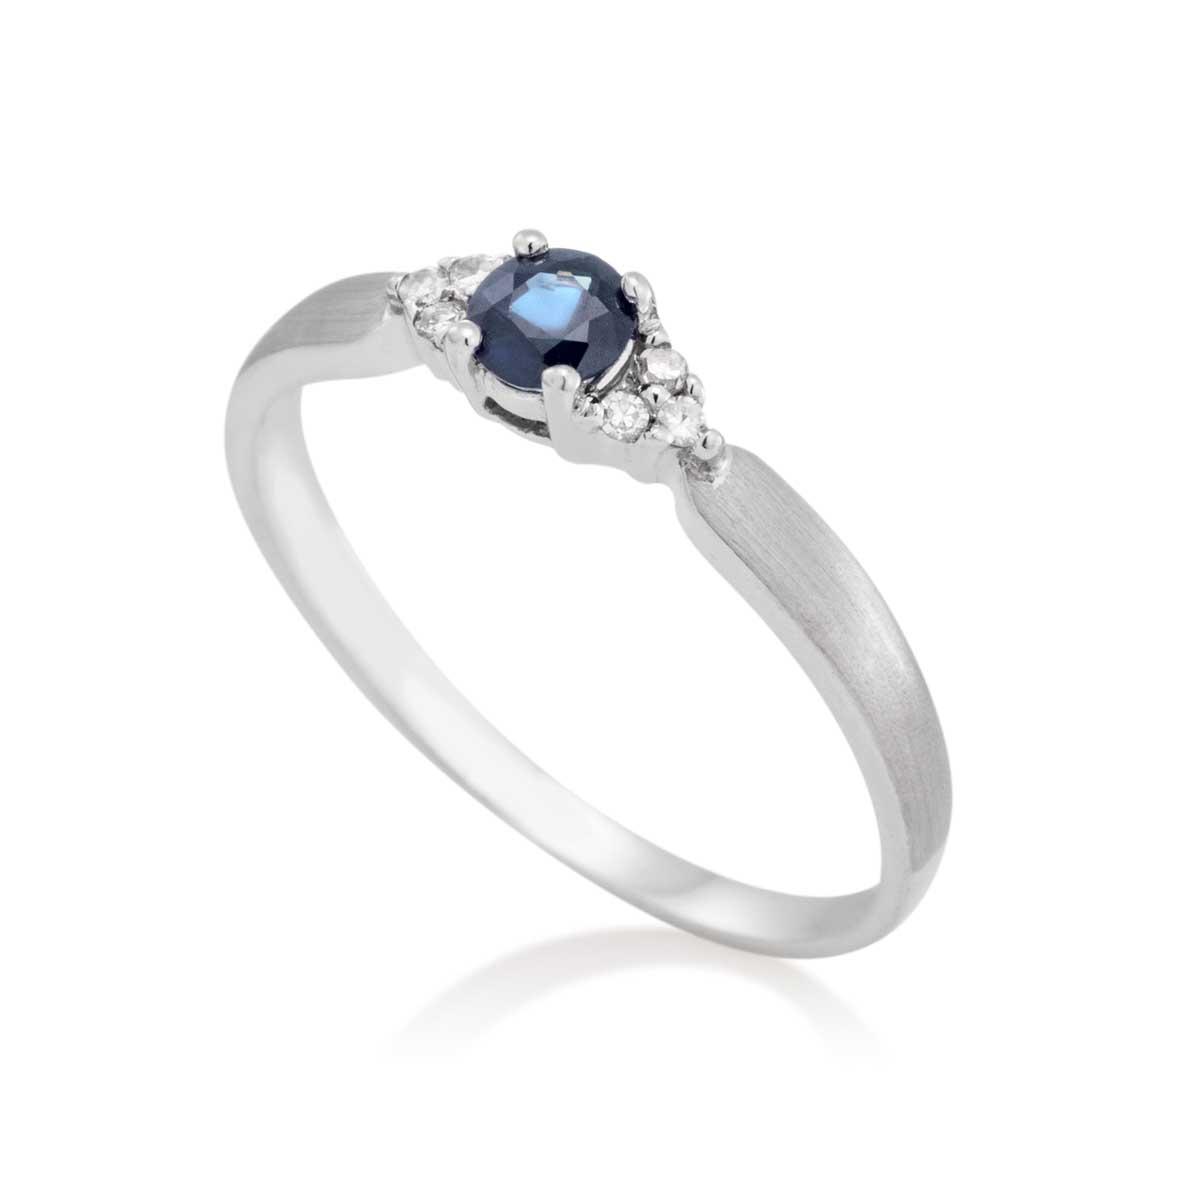 Anel Ouro Branco Safira e Diamante - Colecao Pedras Orientais 870f114d0f